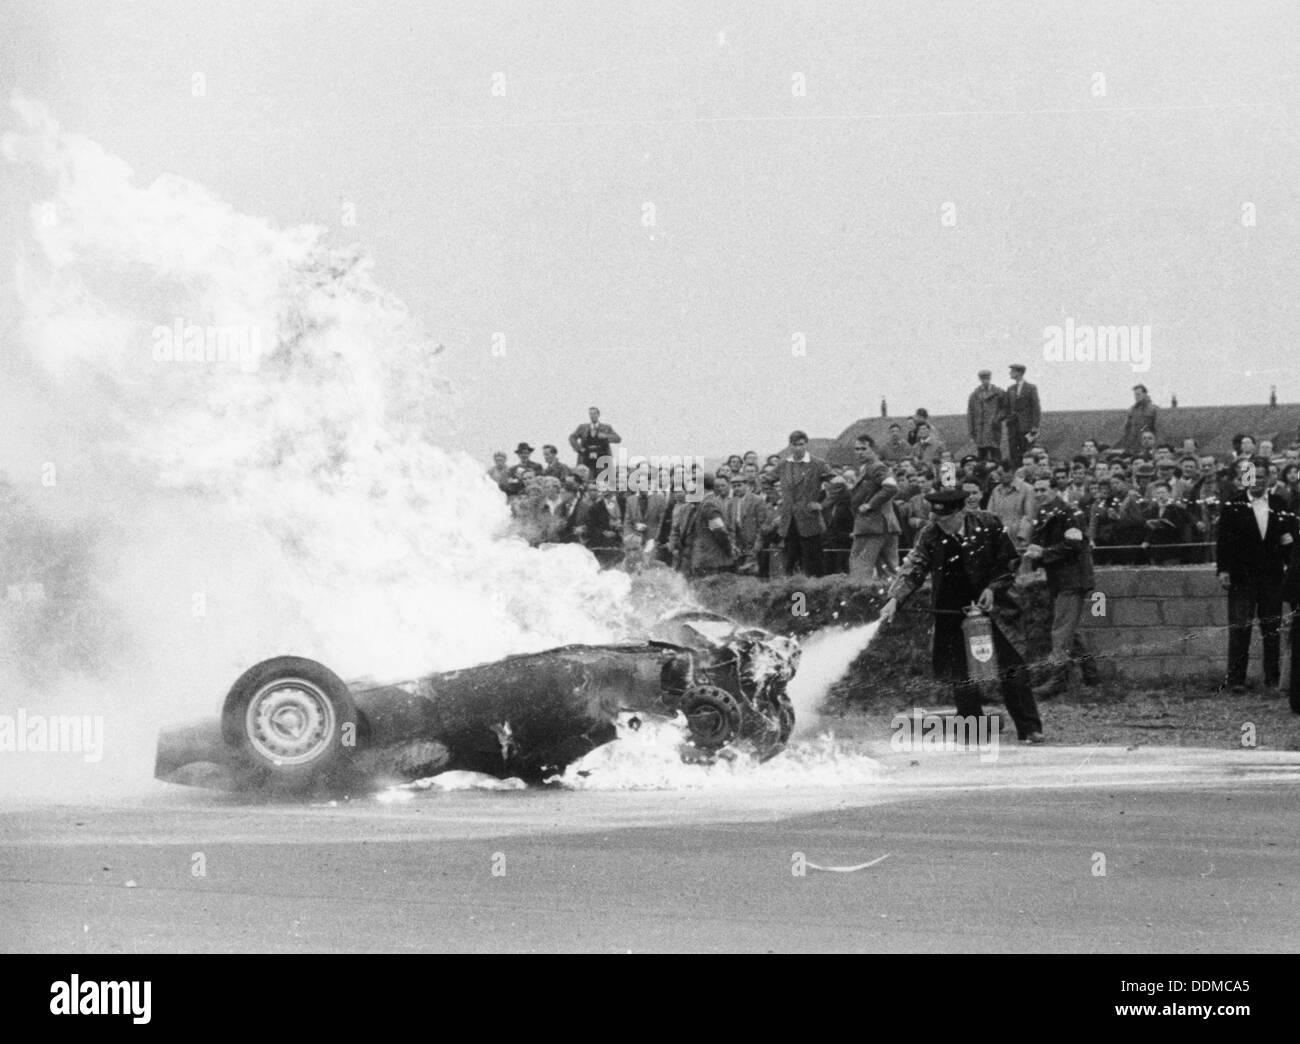 Tony Brooks 39 Car On Fire At The British Grand Prix